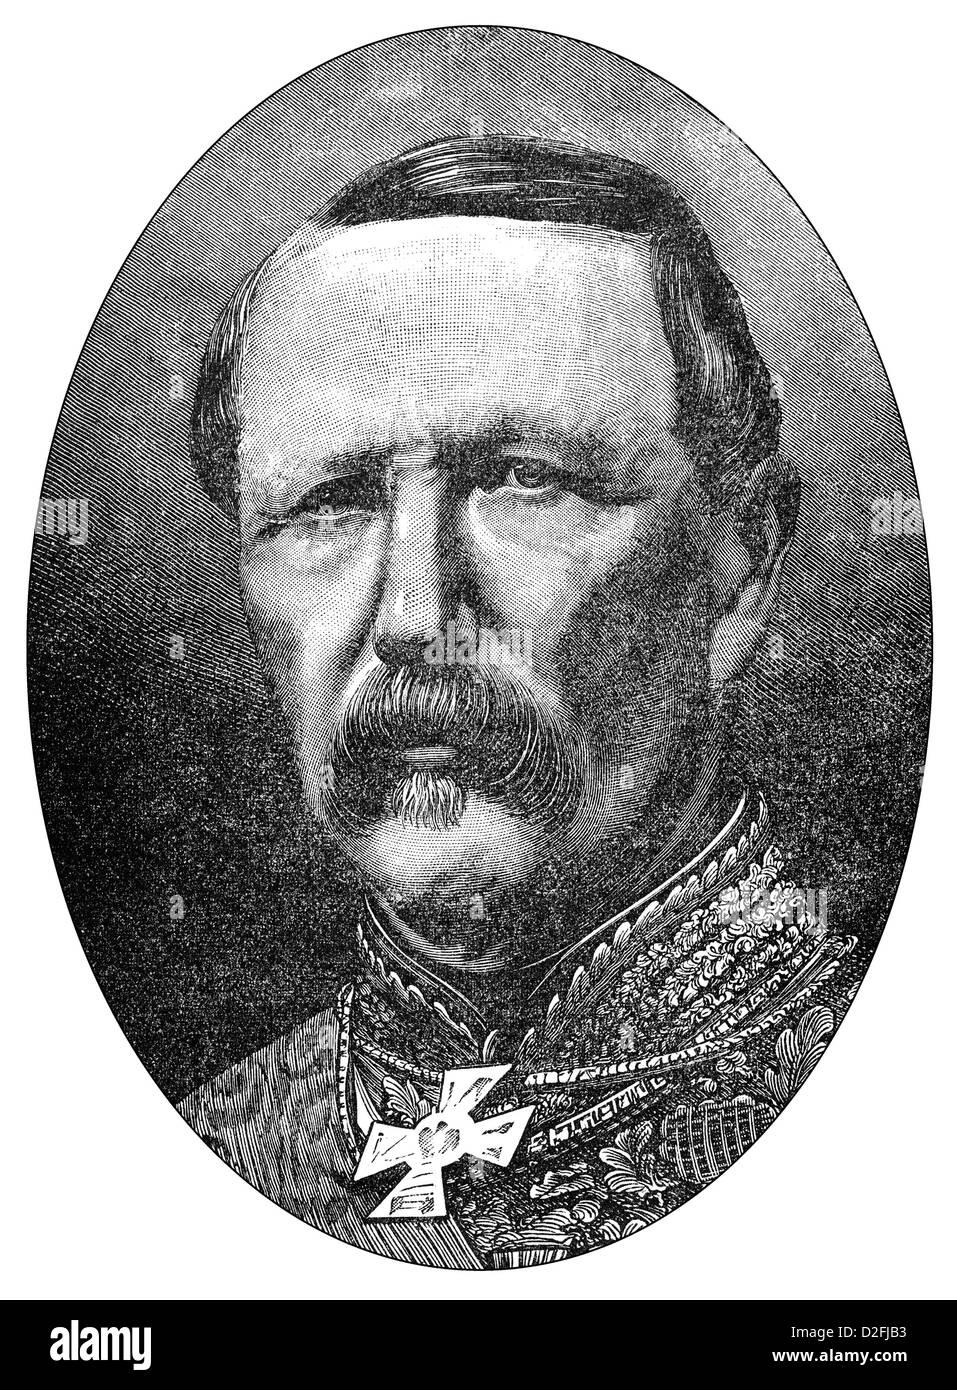 Marie Edme Patrice Maurice, Comte de Mac-Mahon, Duc de Magenta, 1808-1893,  president of the Third Republic - Stock Image